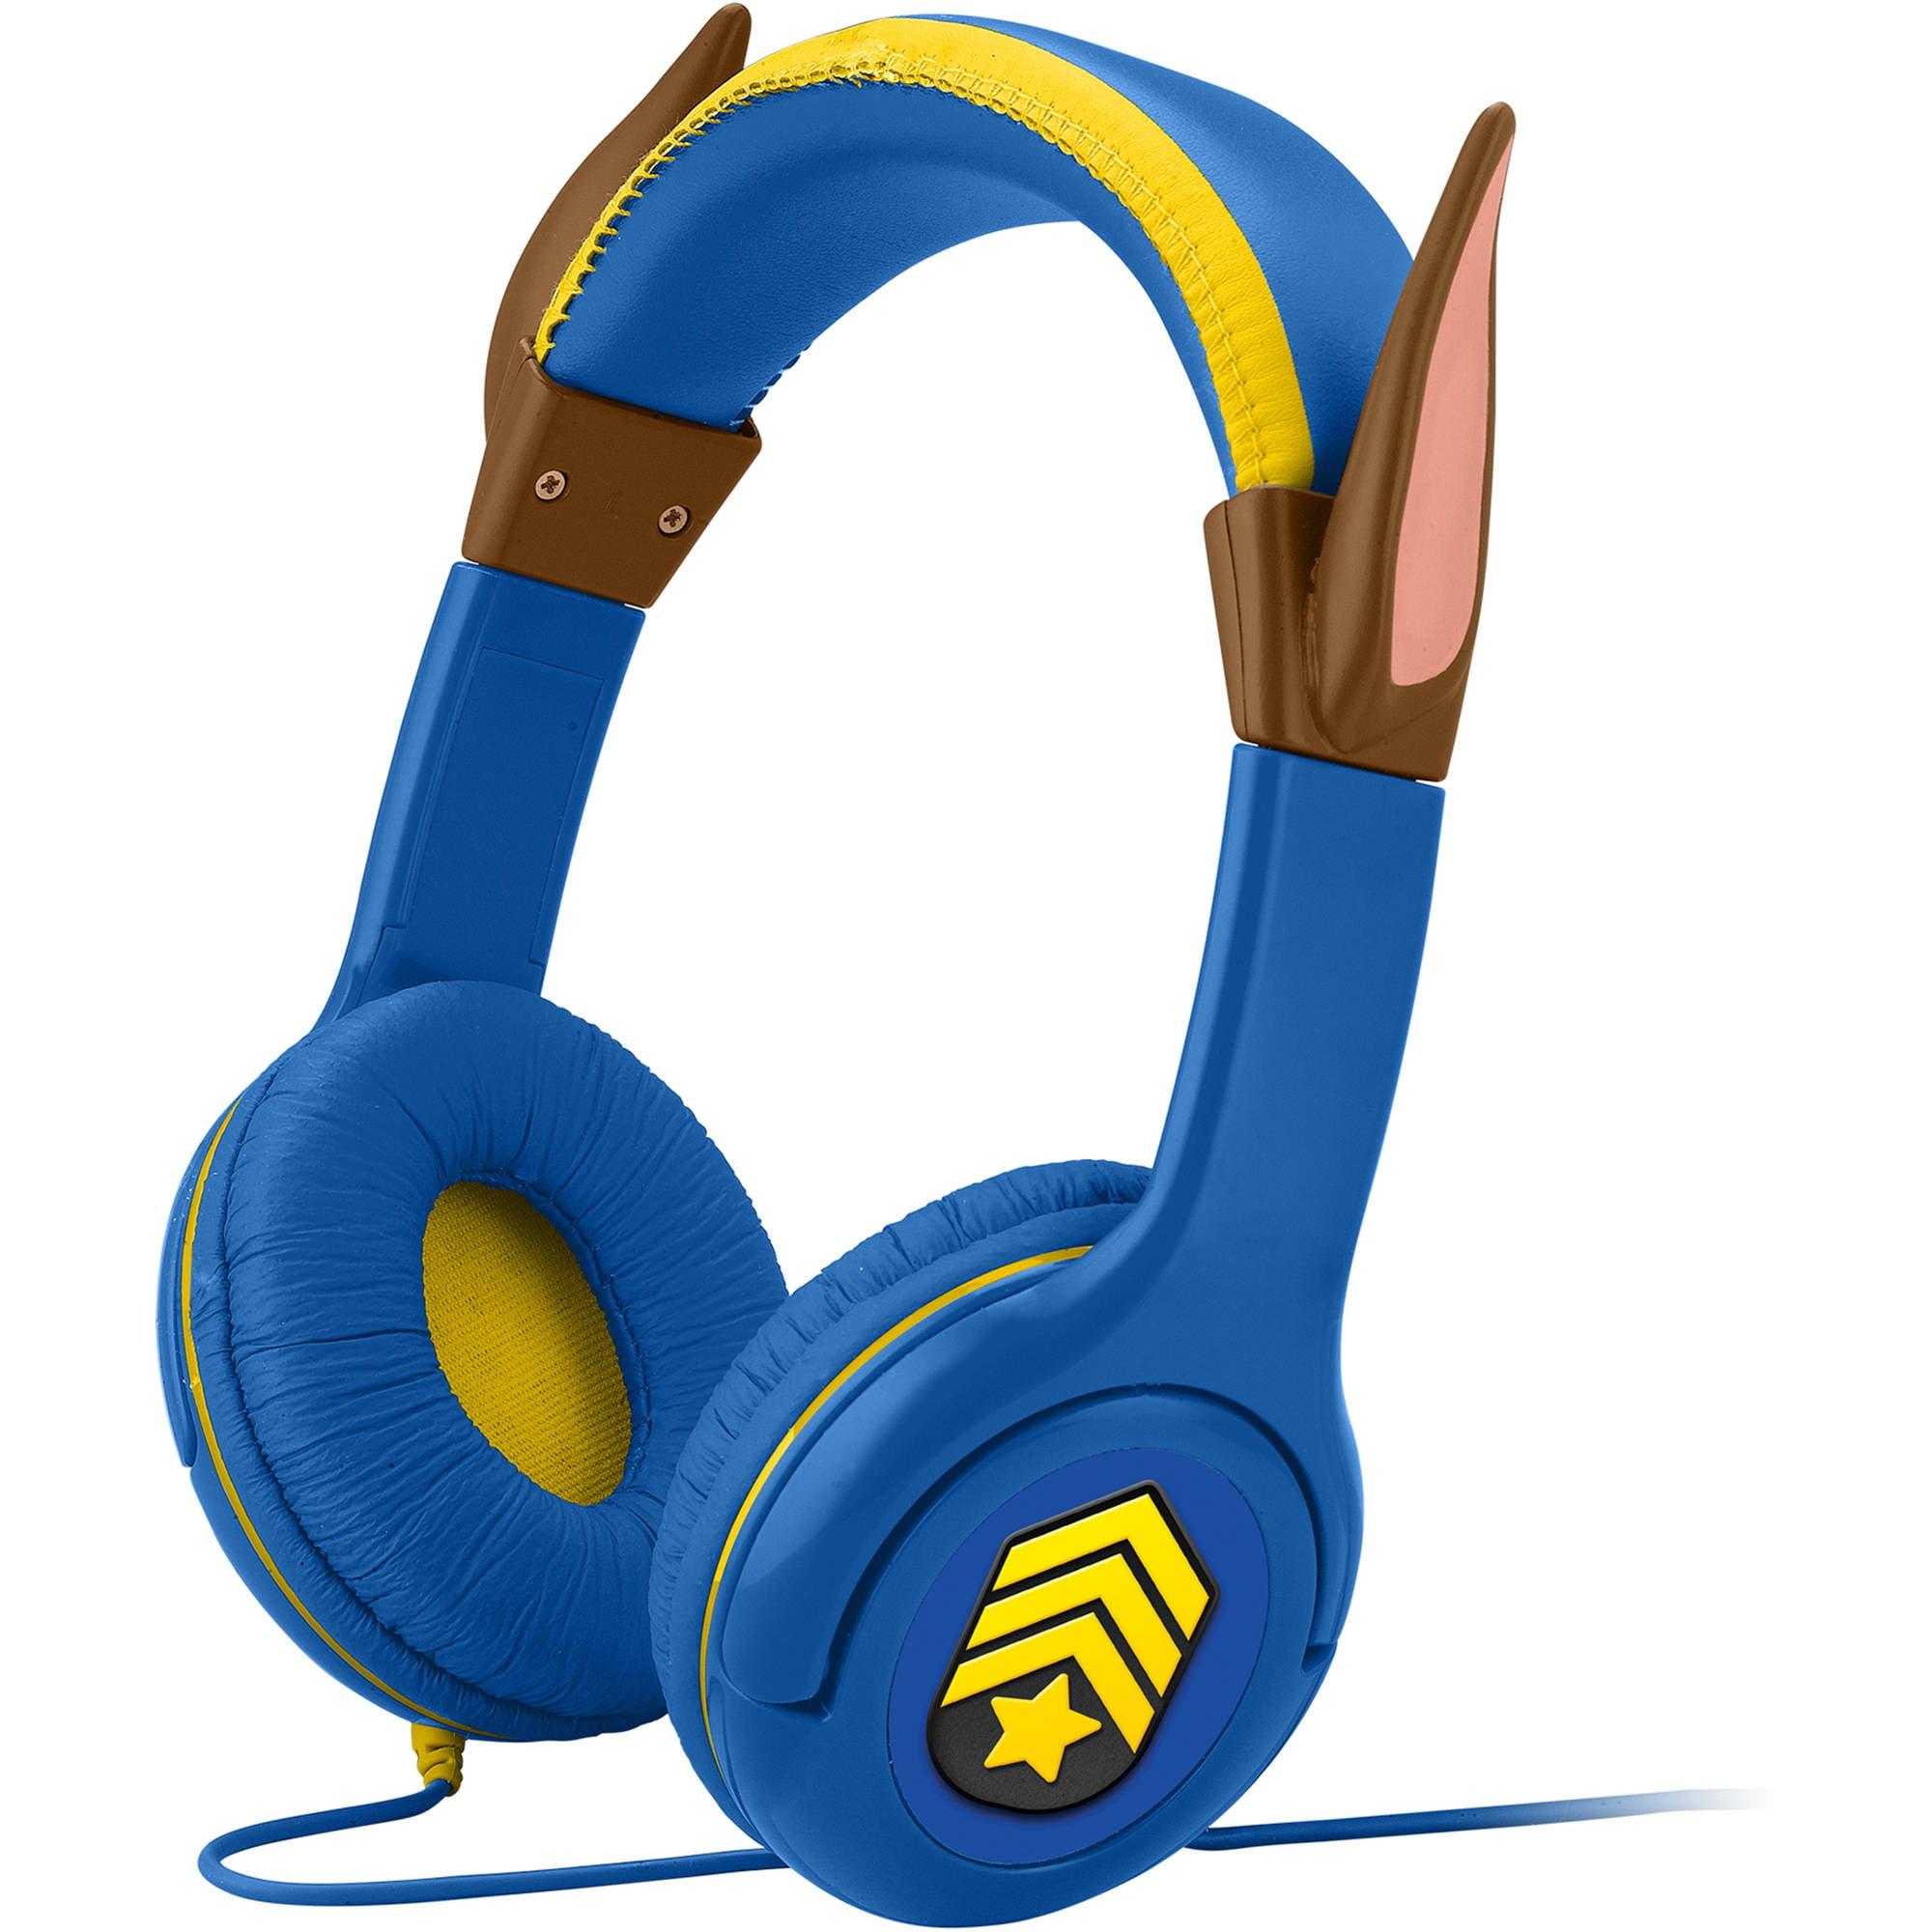 Nickelodeon Paw Patrol Chase Headphones by Paw Patrol